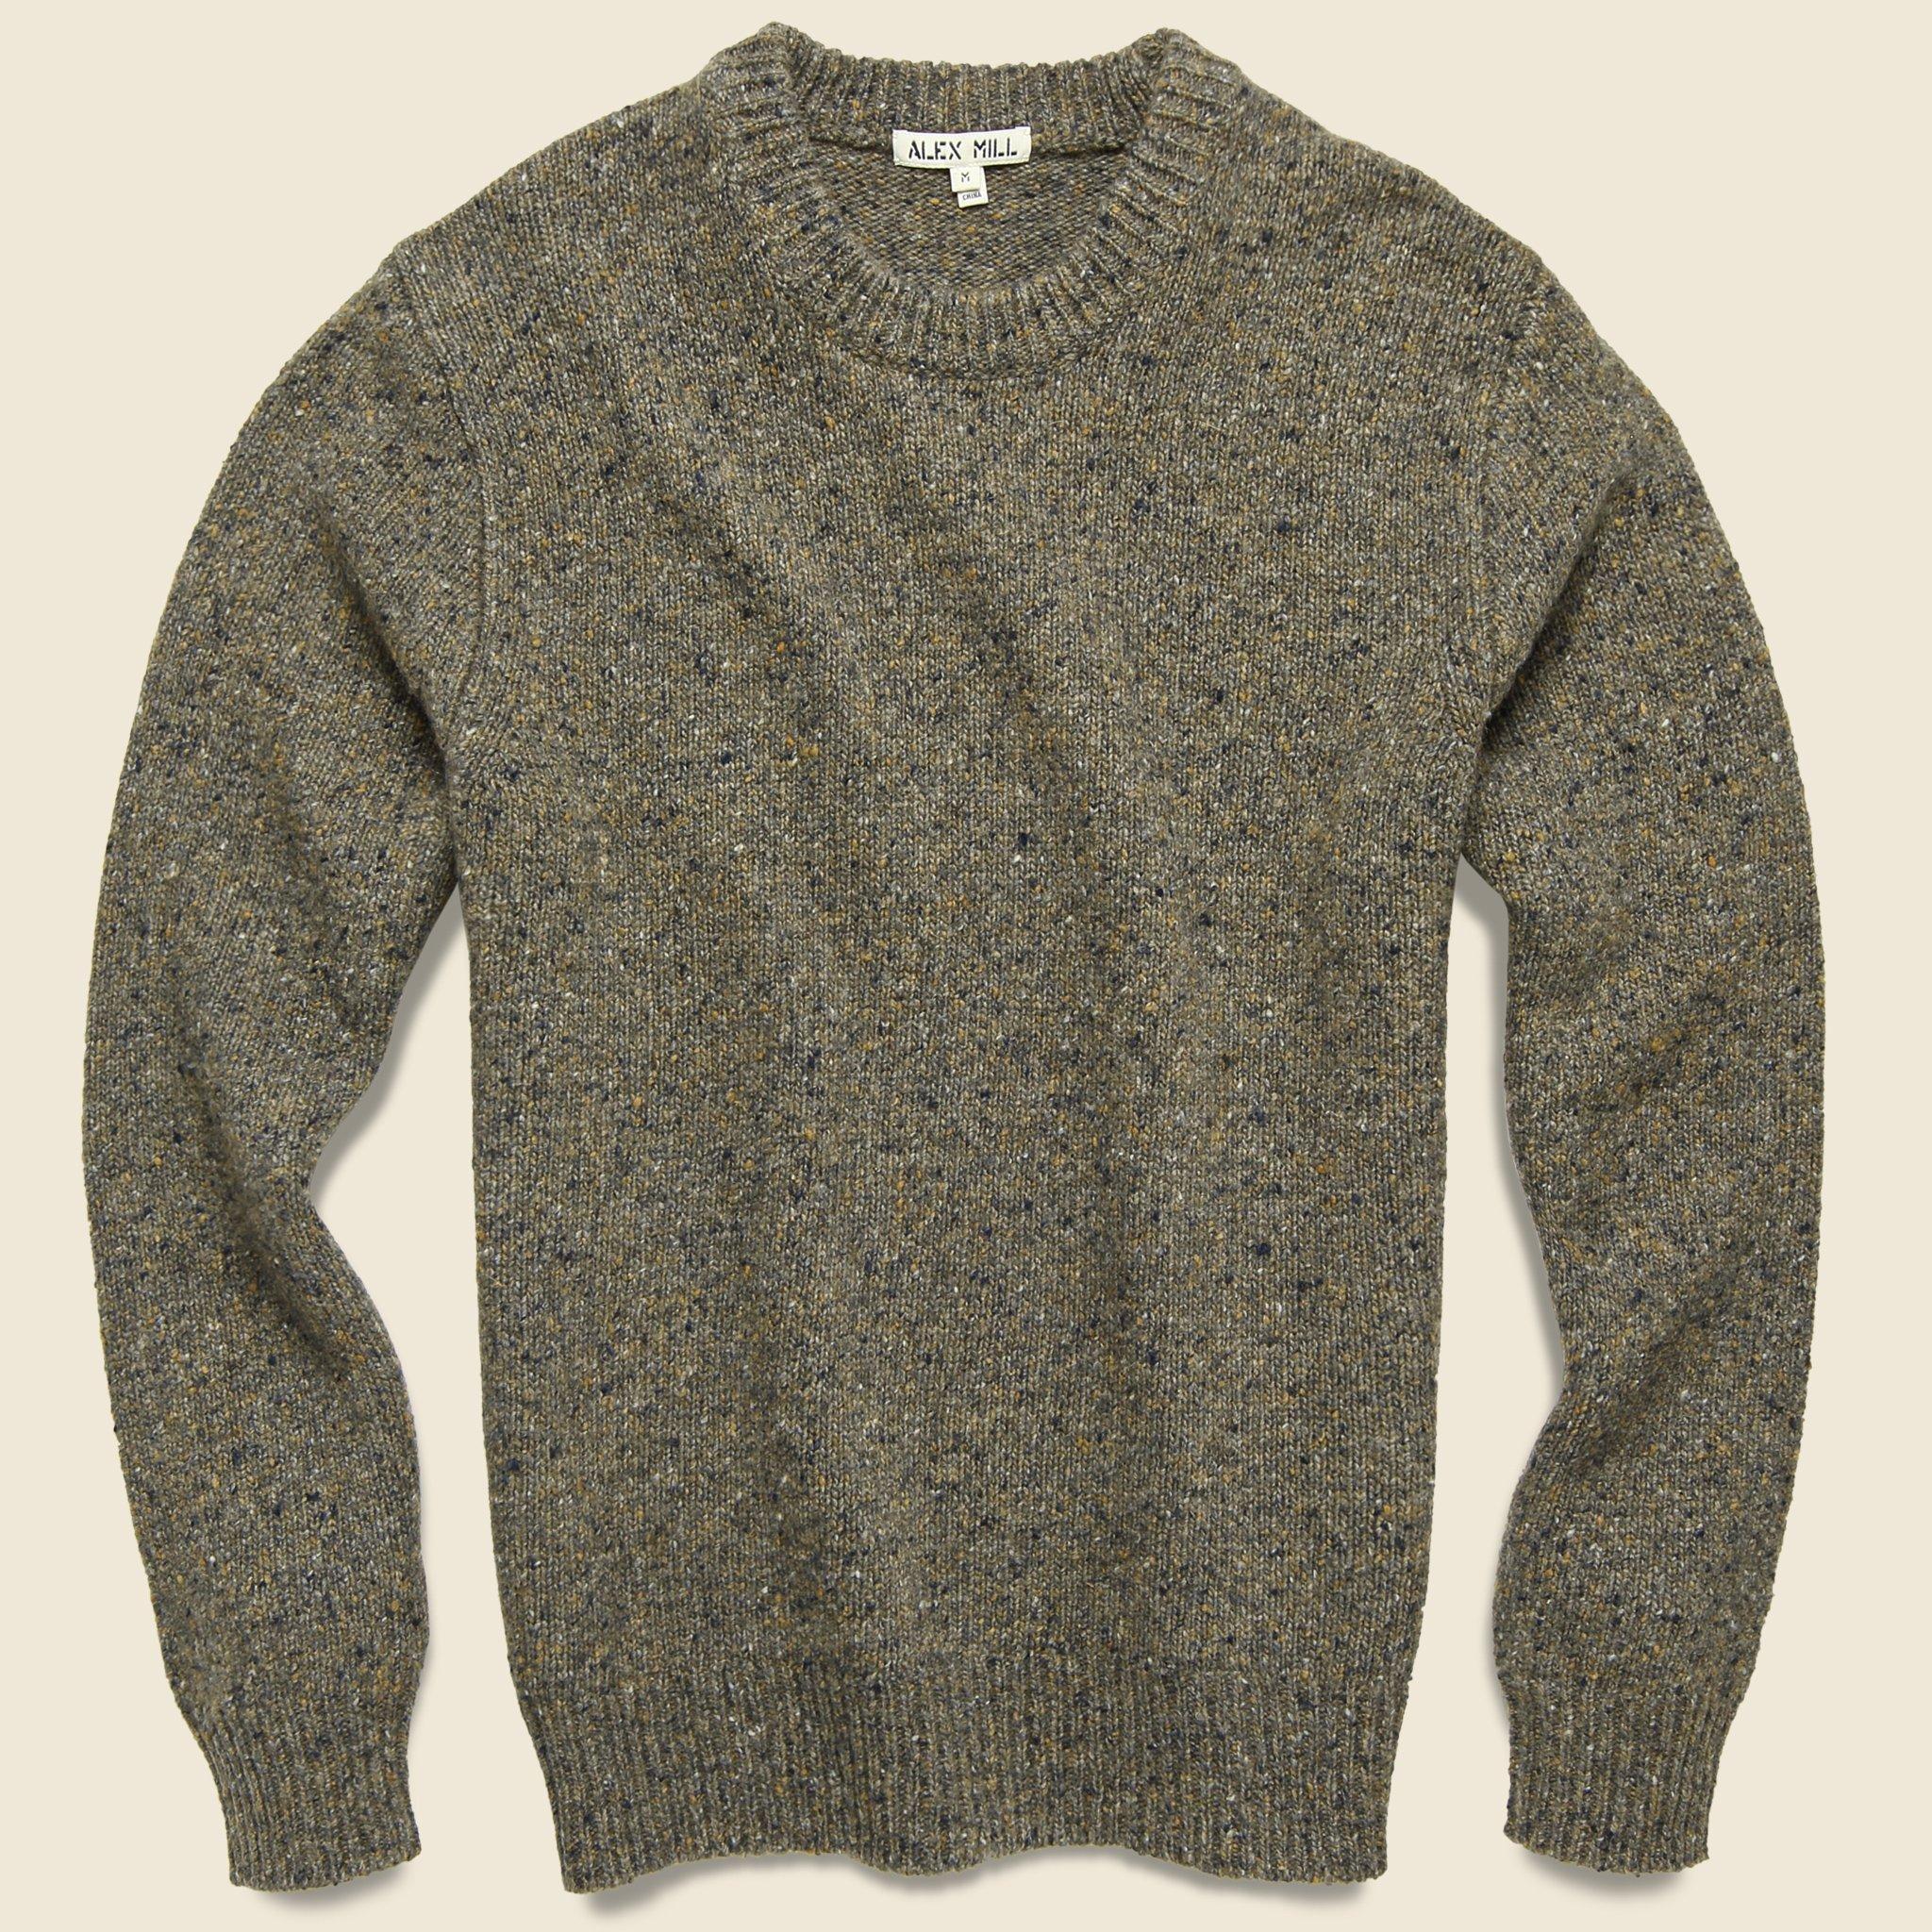 J.CREW sweater shawl neck collar merino wool nylon Donegal olive green new nwt